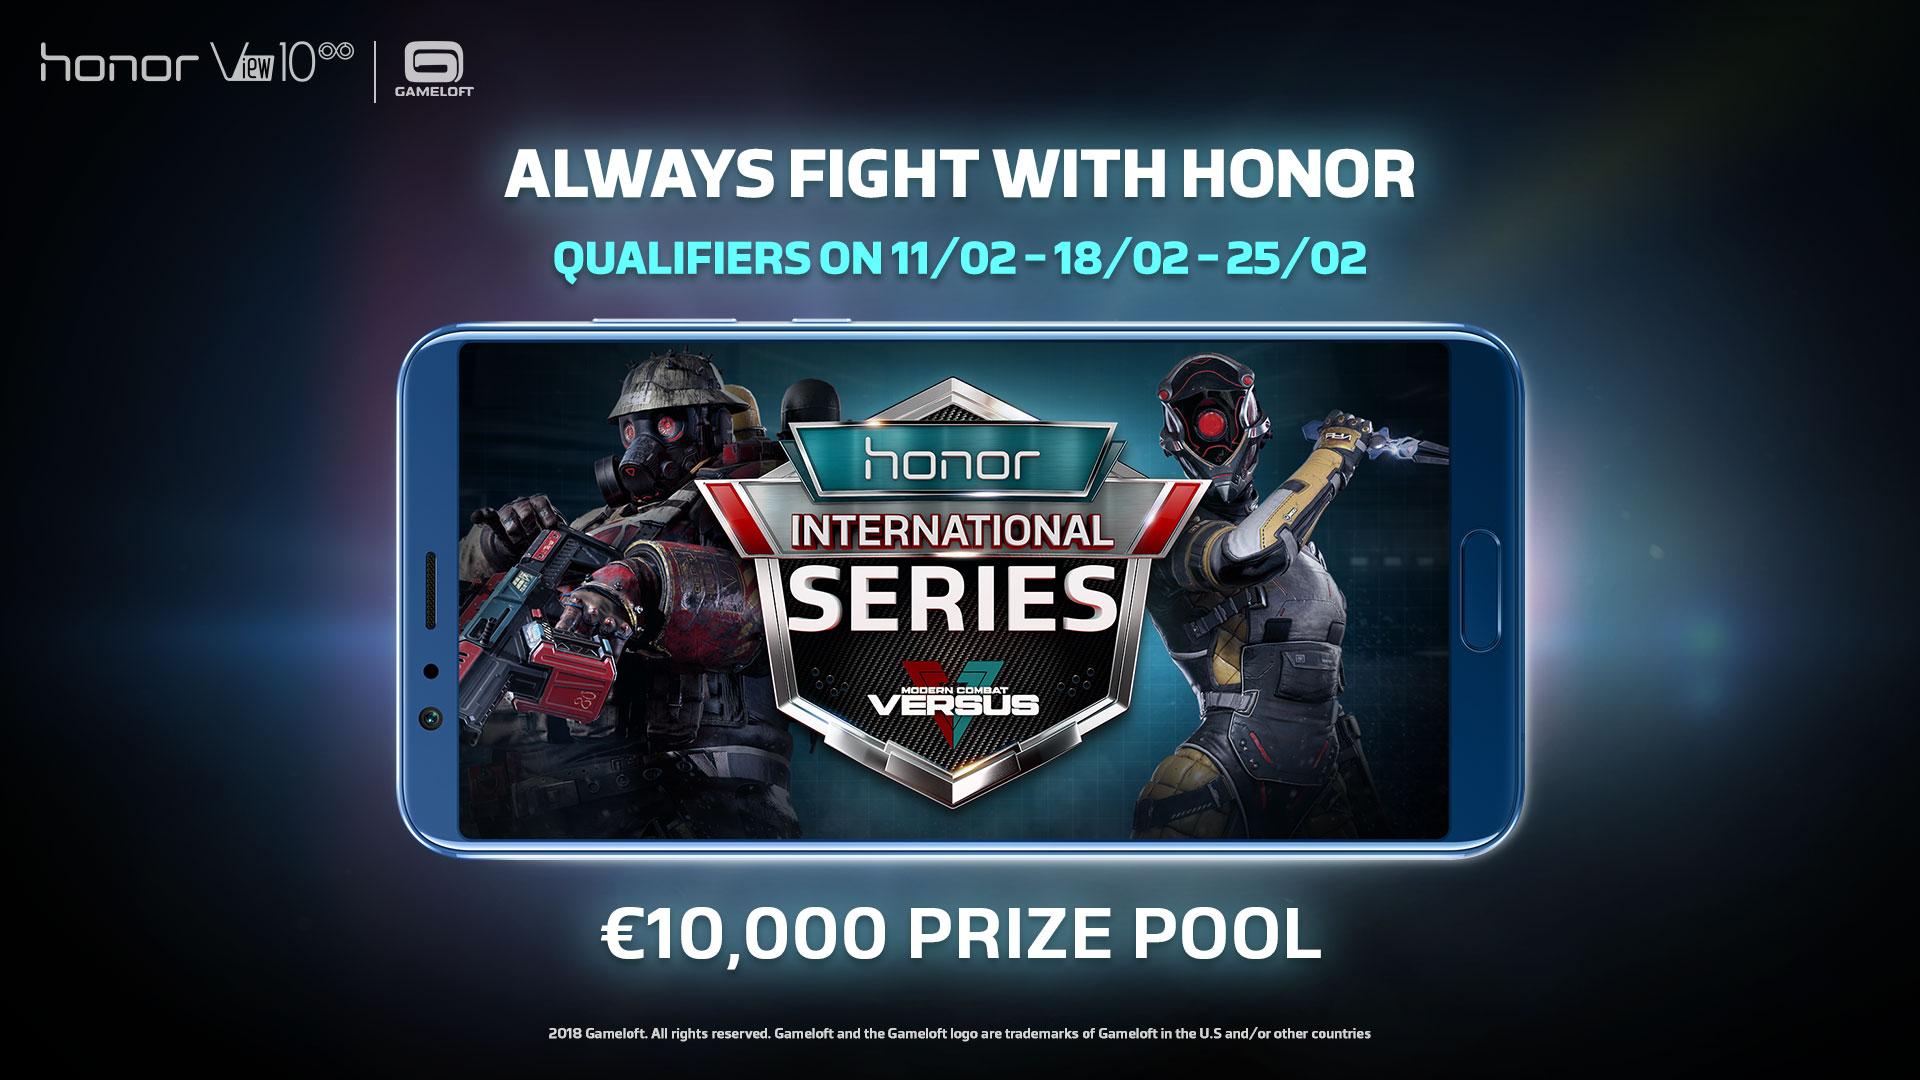 honor View 10与Gameloft合作,联手打造Modern Combat Versus国际手游竞赛!